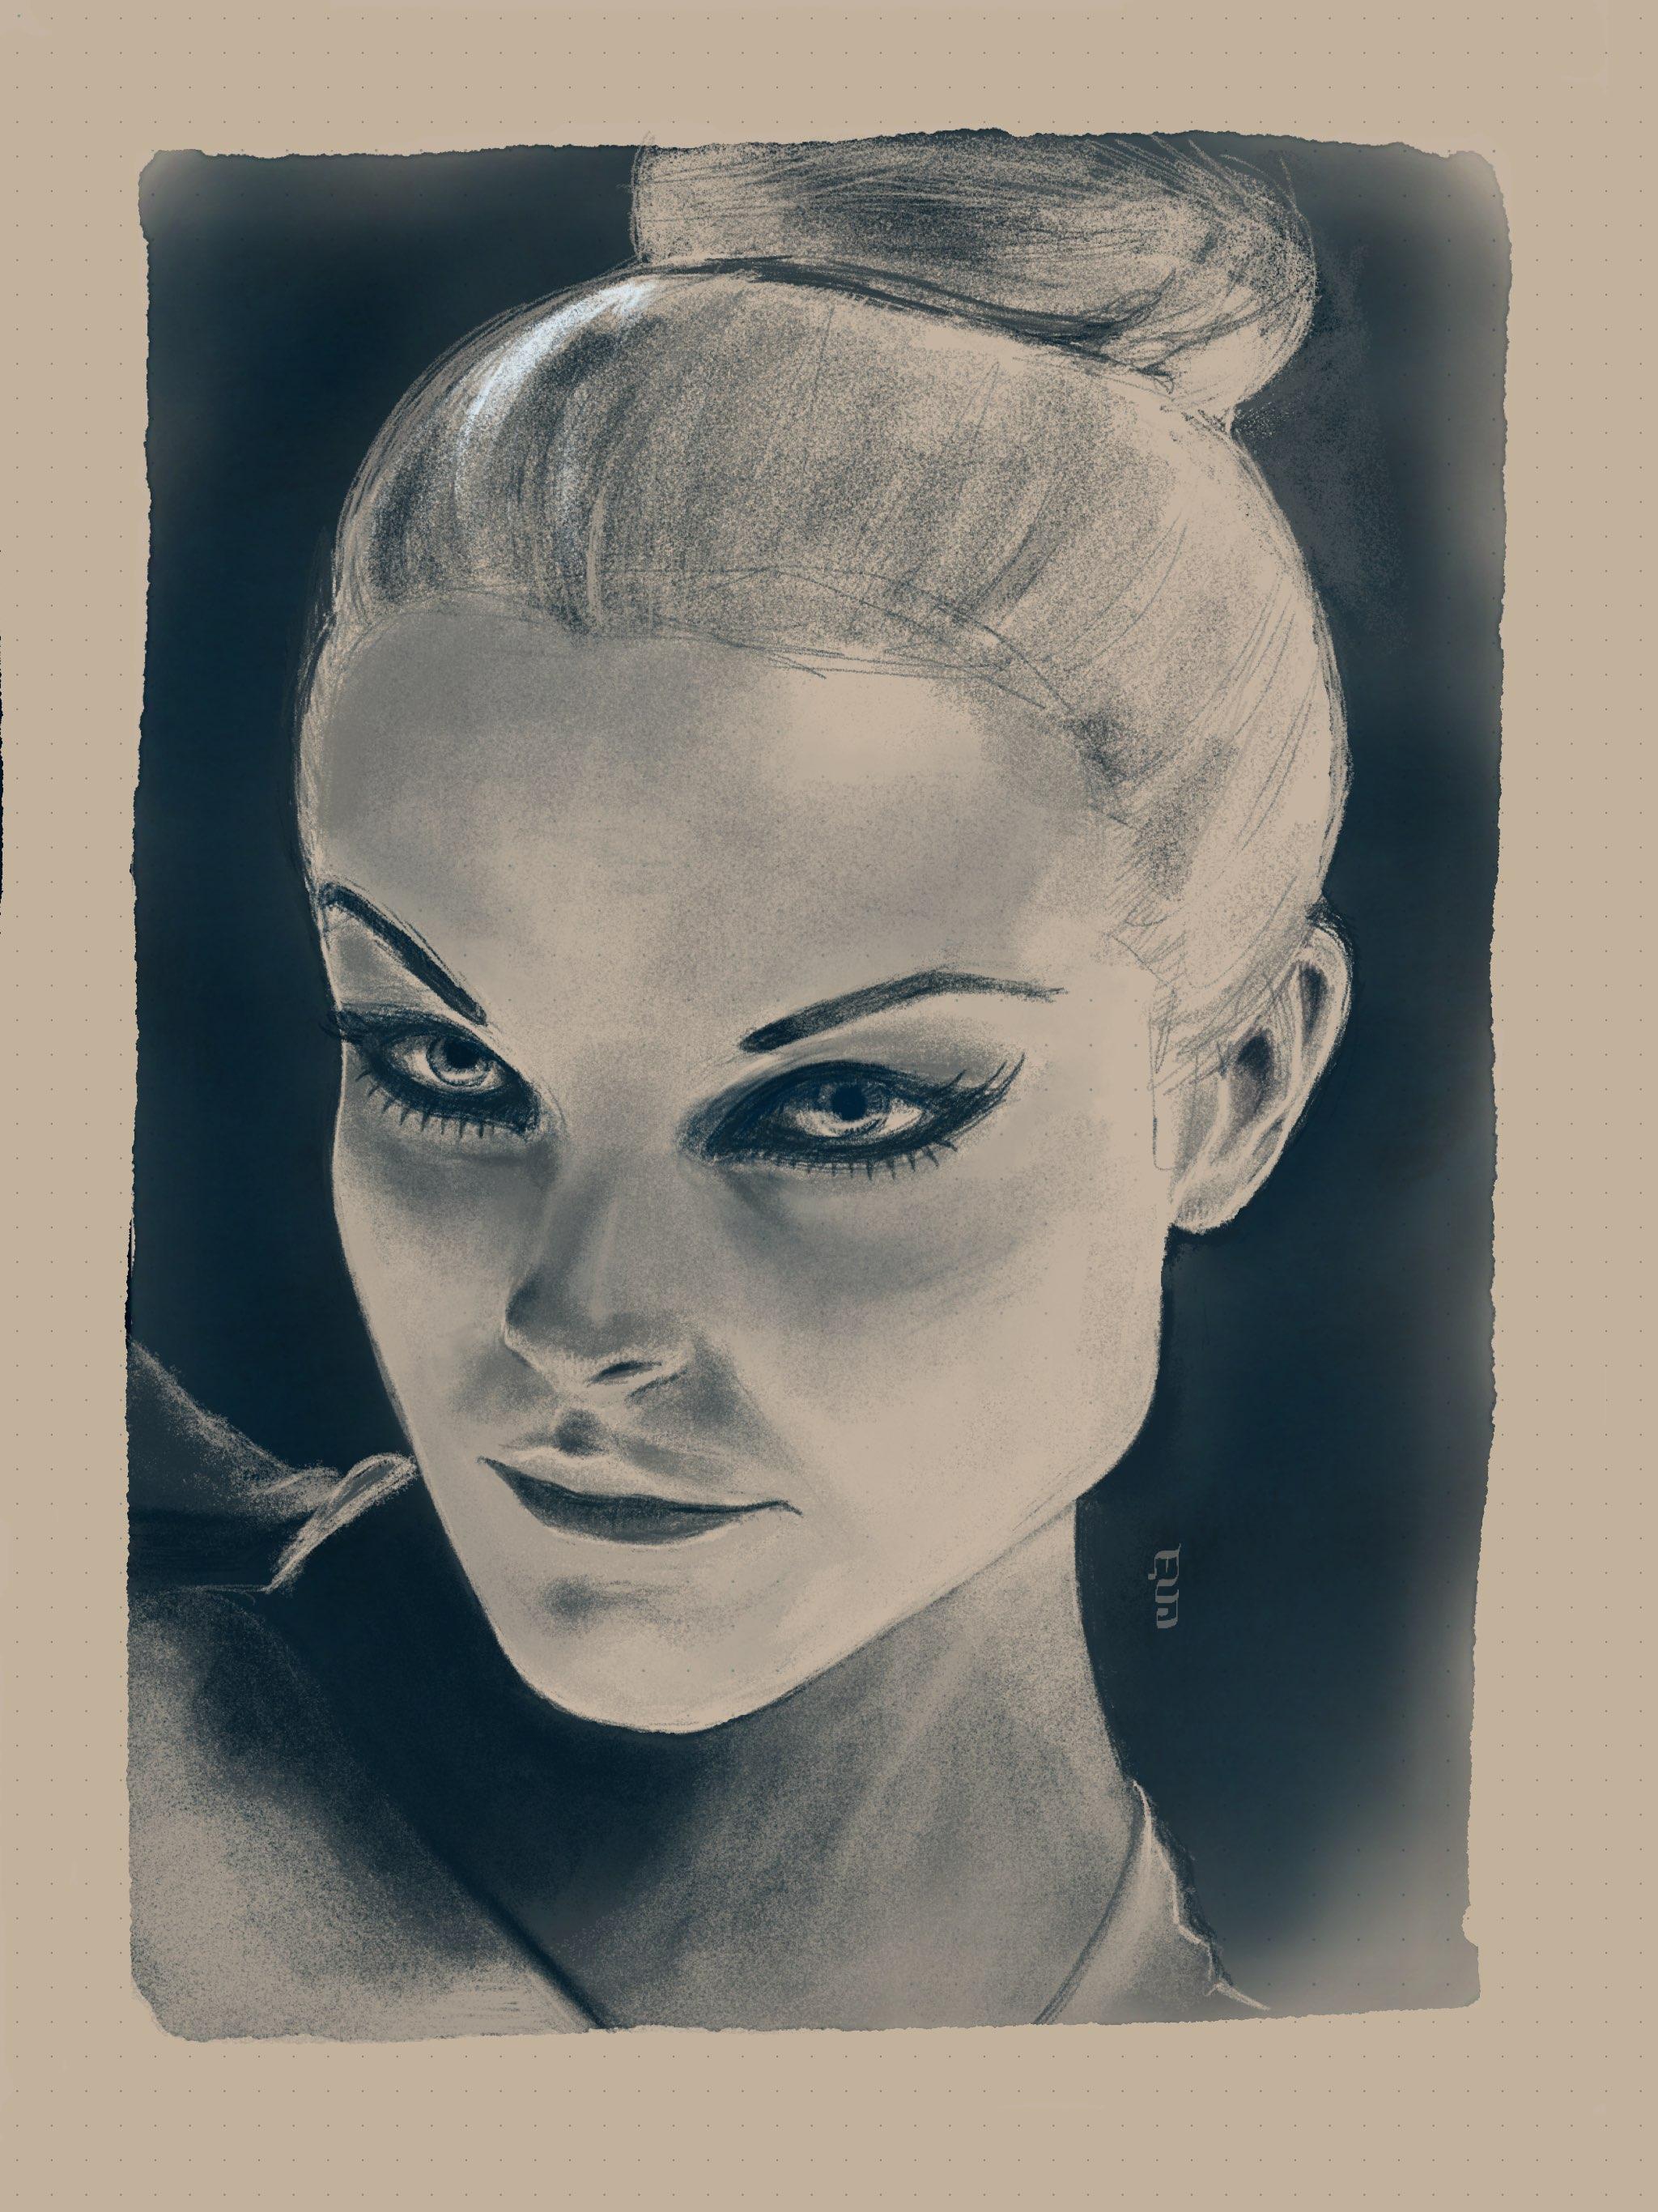 Beau Garrett made with Sketches